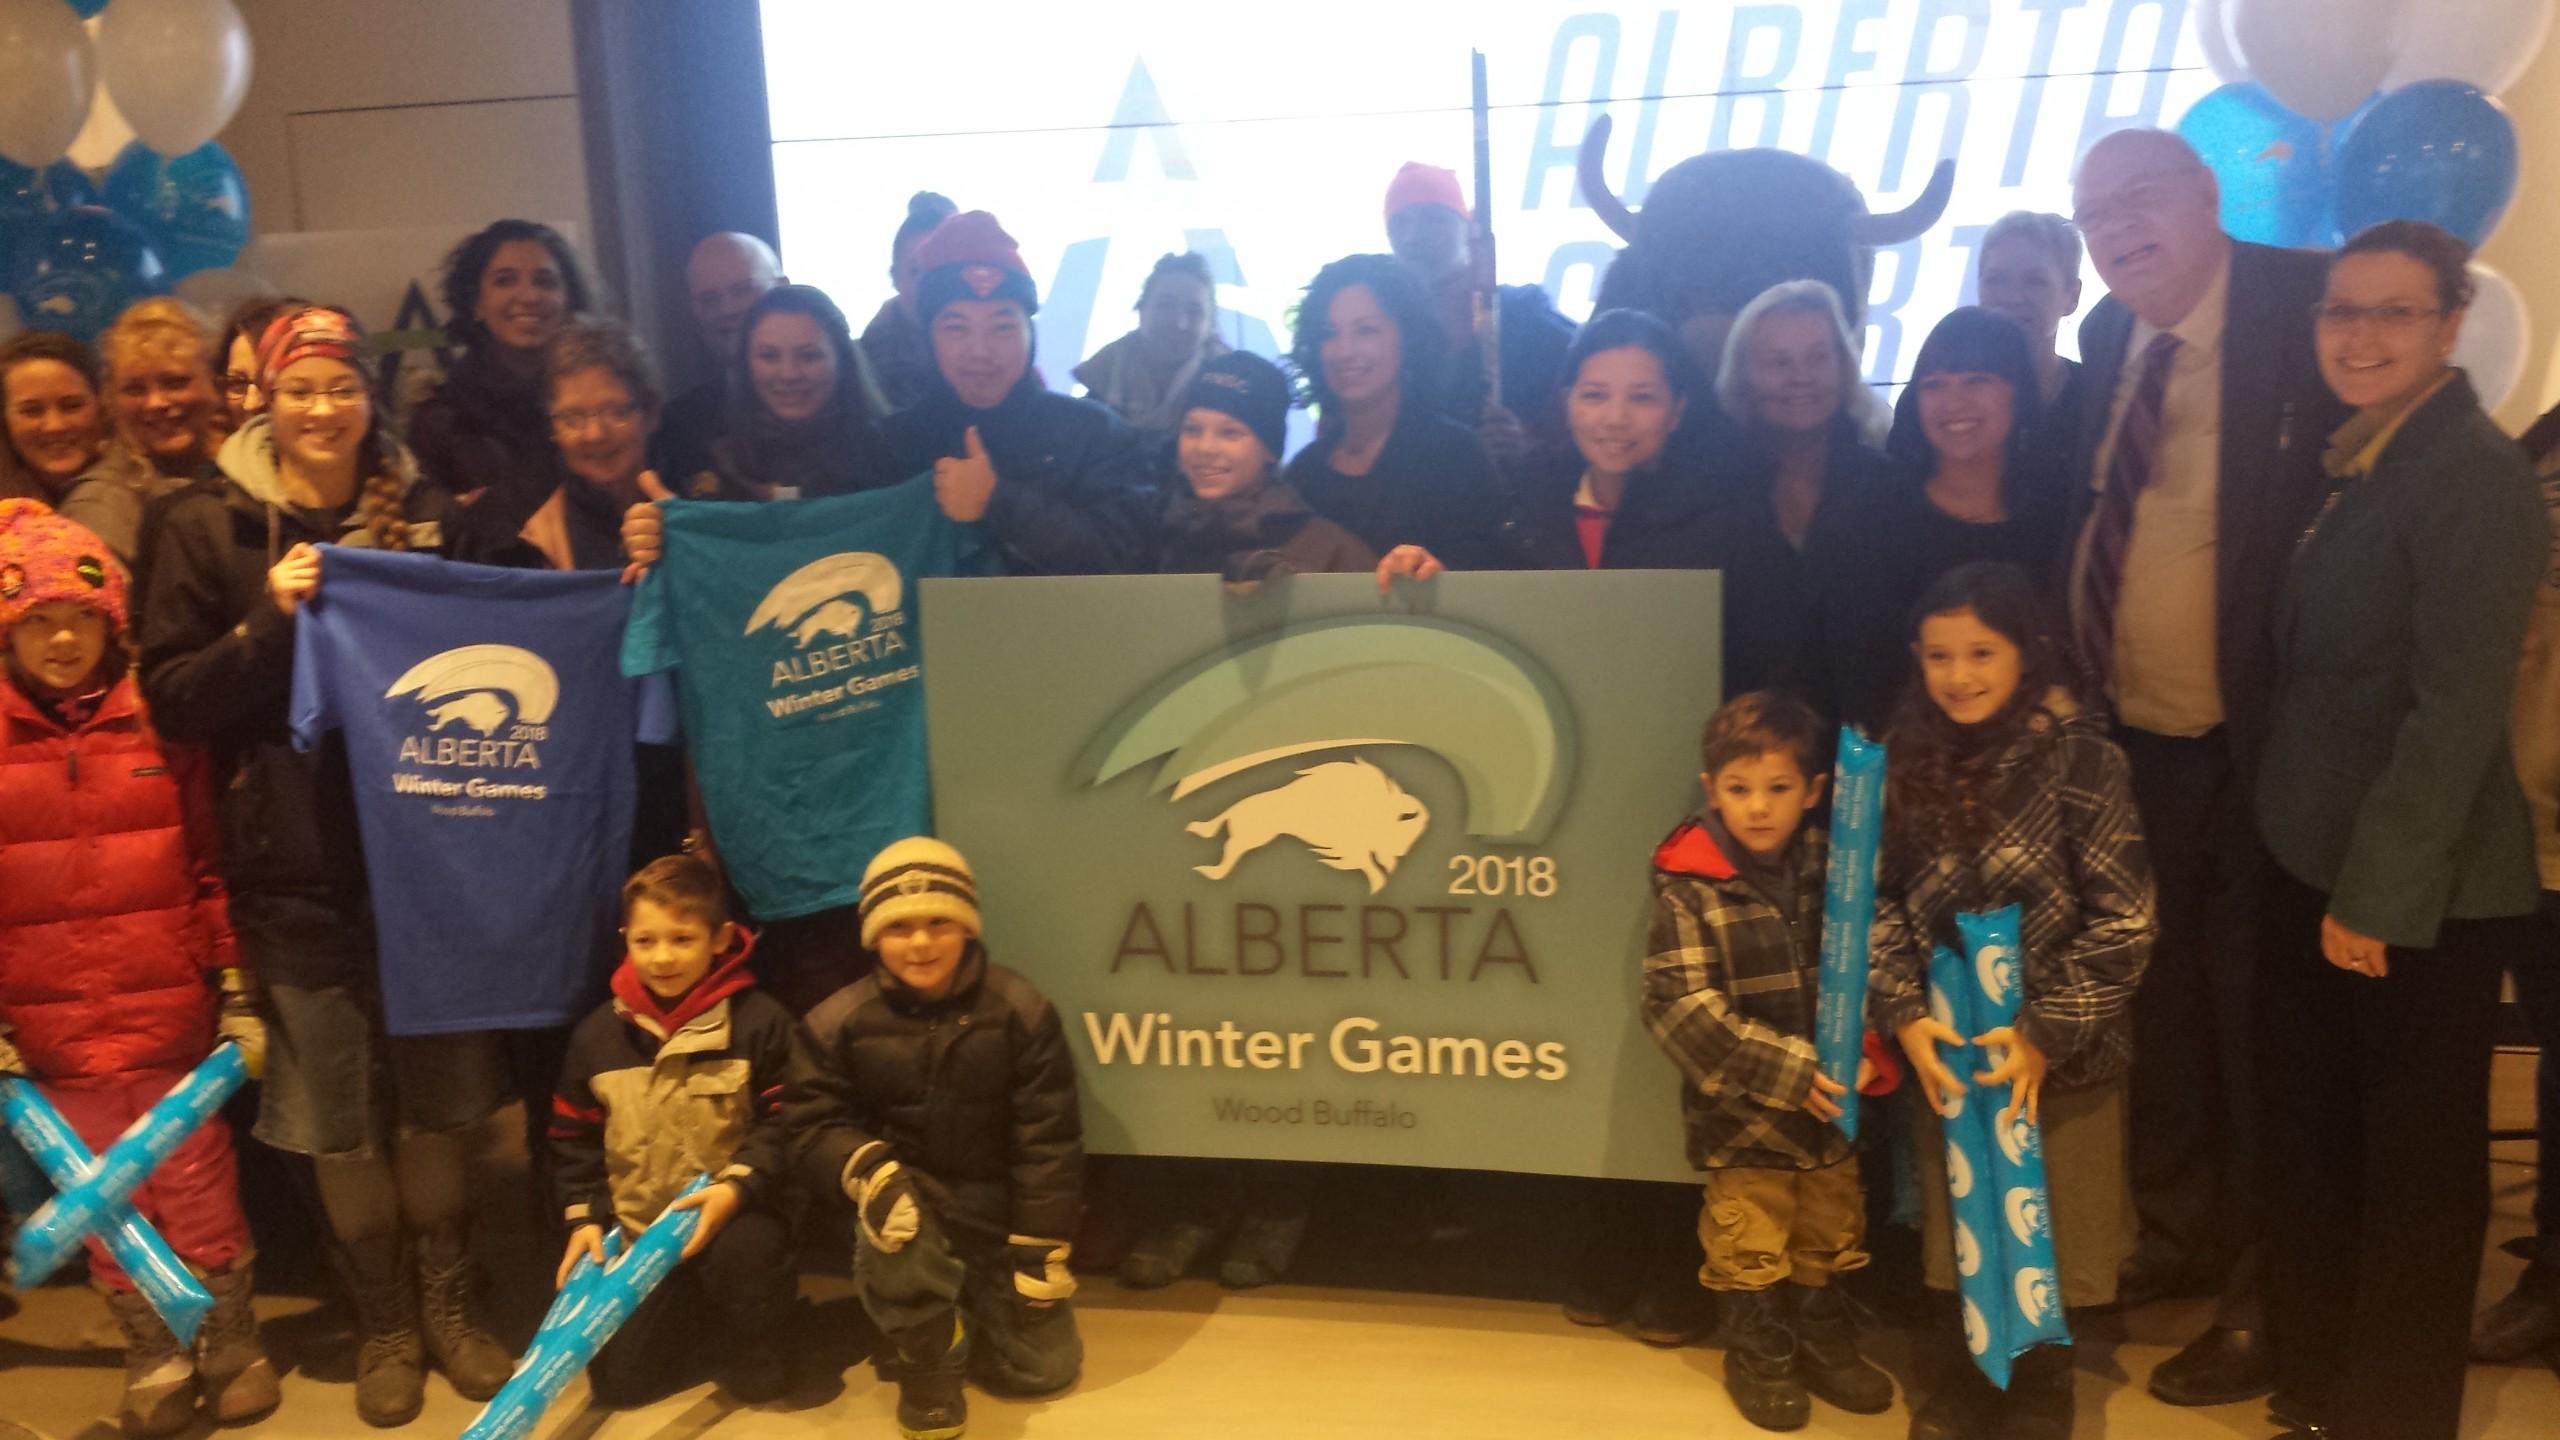 RMWB seeking feedback on 2018 Alberta Winter Games